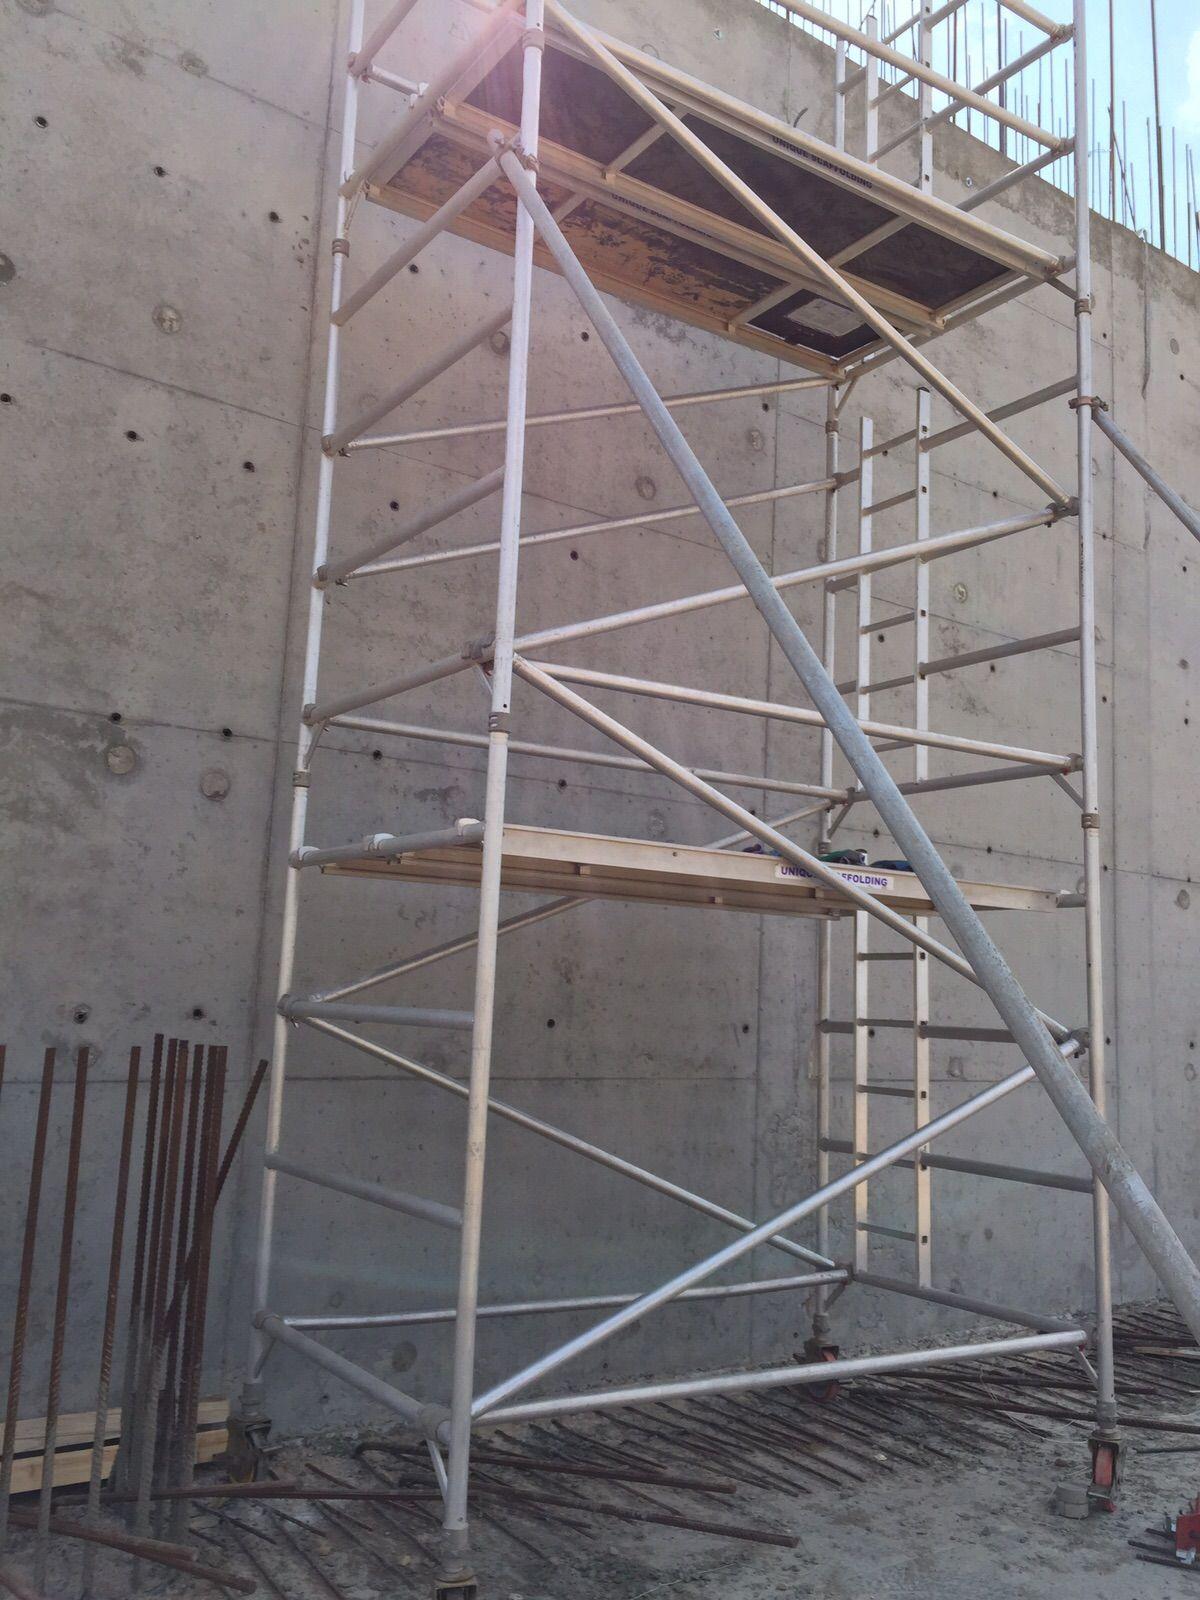 aluminium scaffolding suppliers in uae,scaffolding parts suppliers